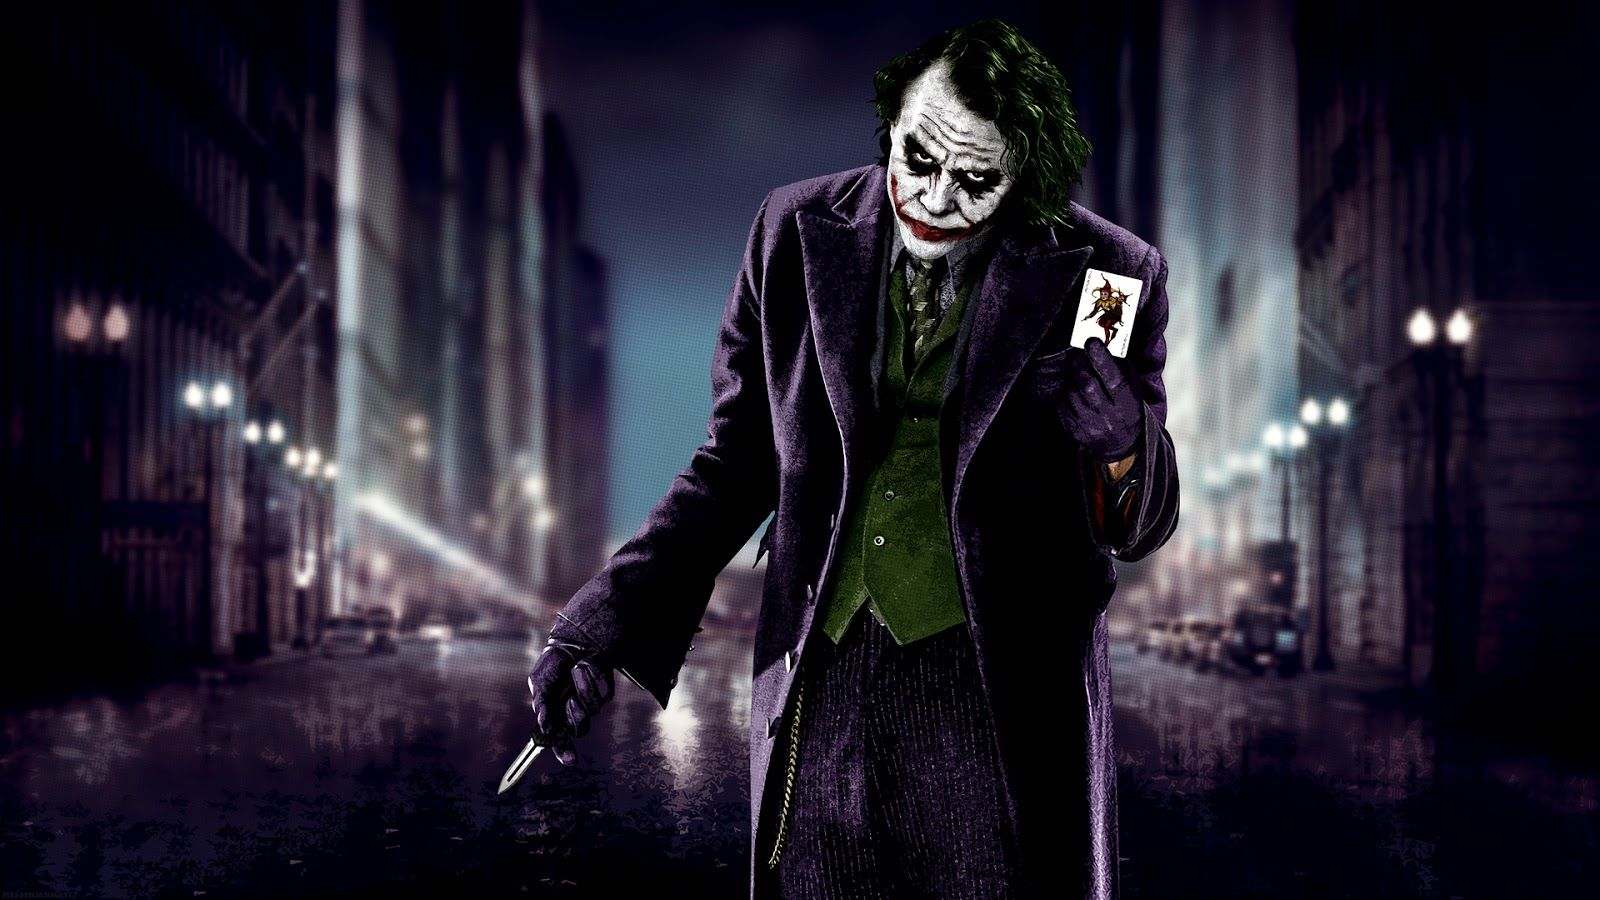 Image Result For Joker Hd Wallpaper Free Download